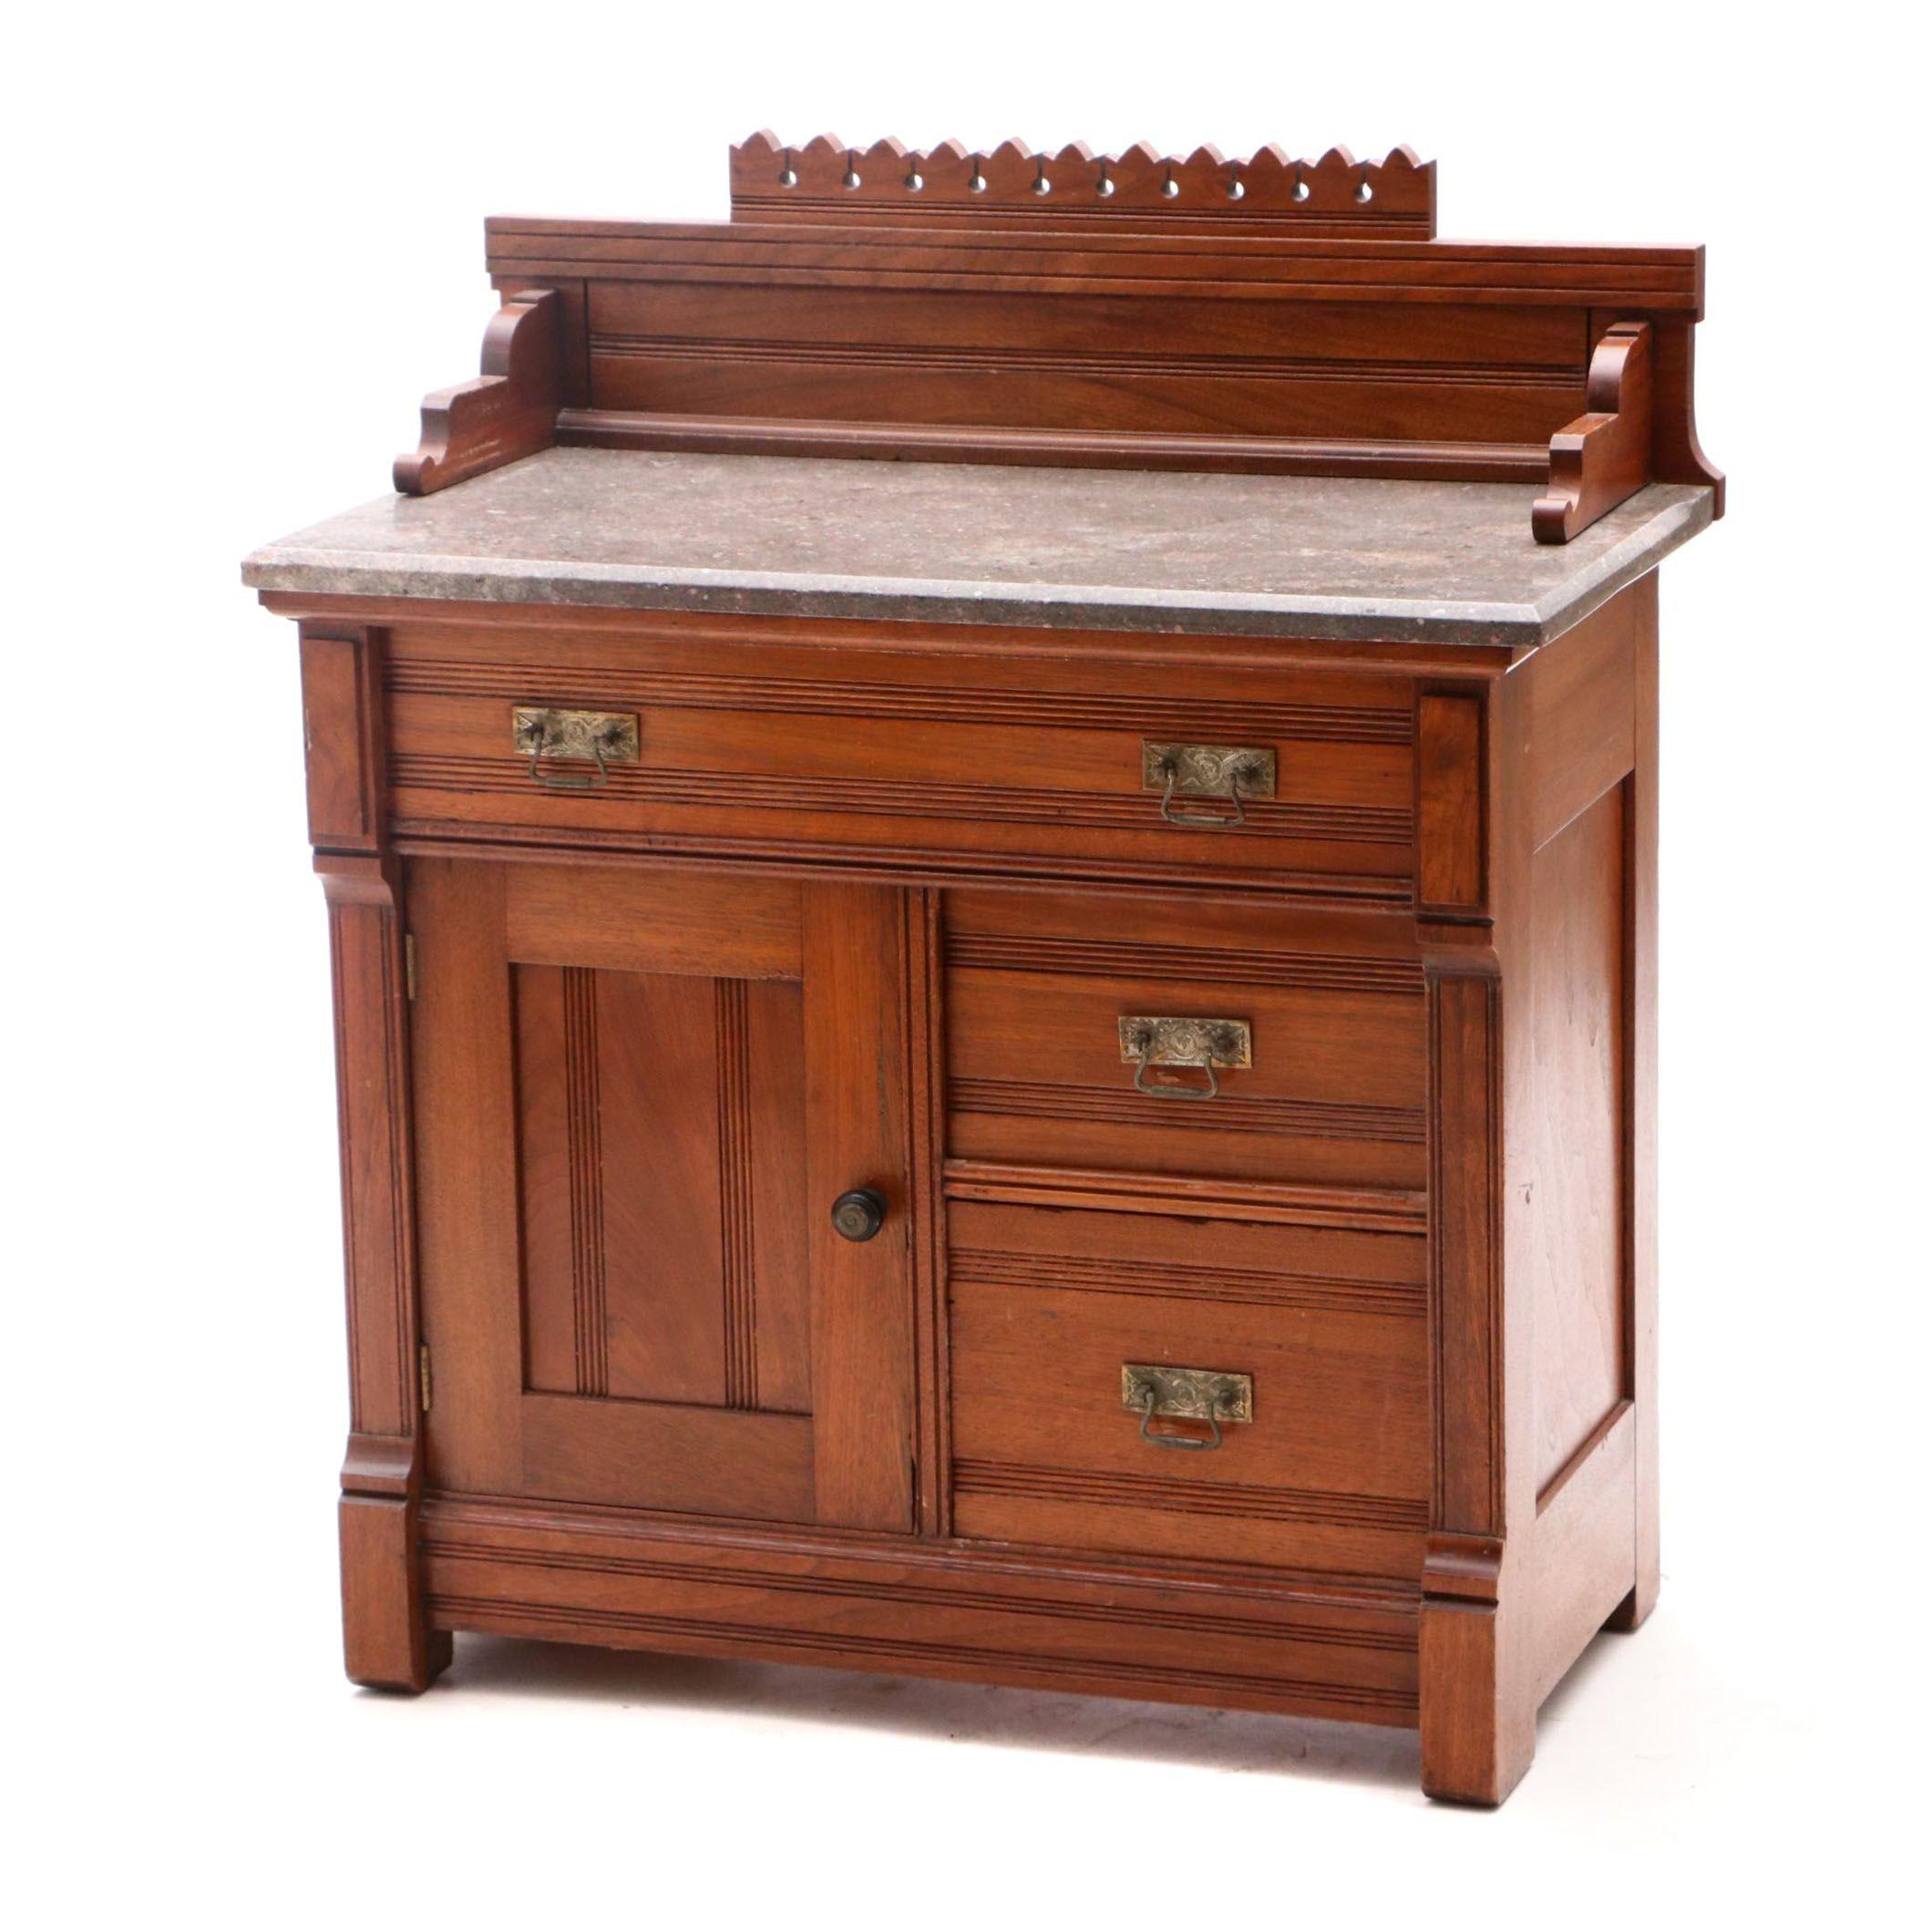 Eastlake Style Marble Top Wash Stand Cabinet in Oak by Berkey & Gay